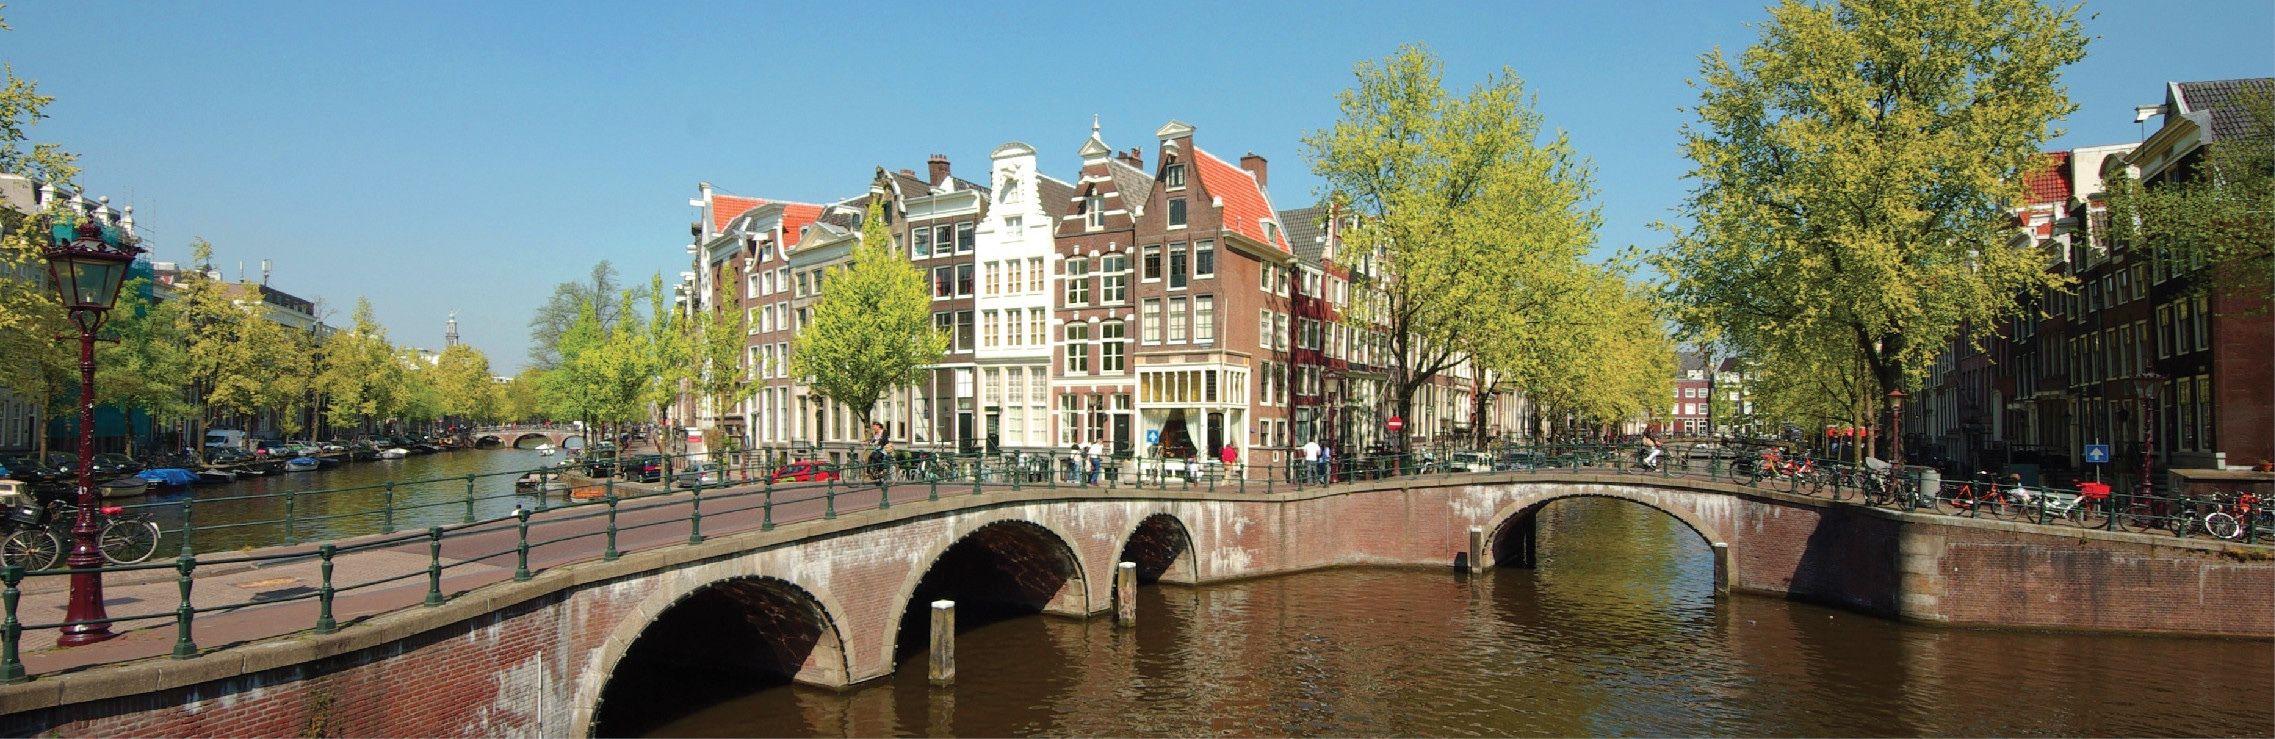 PyData Amsterdam